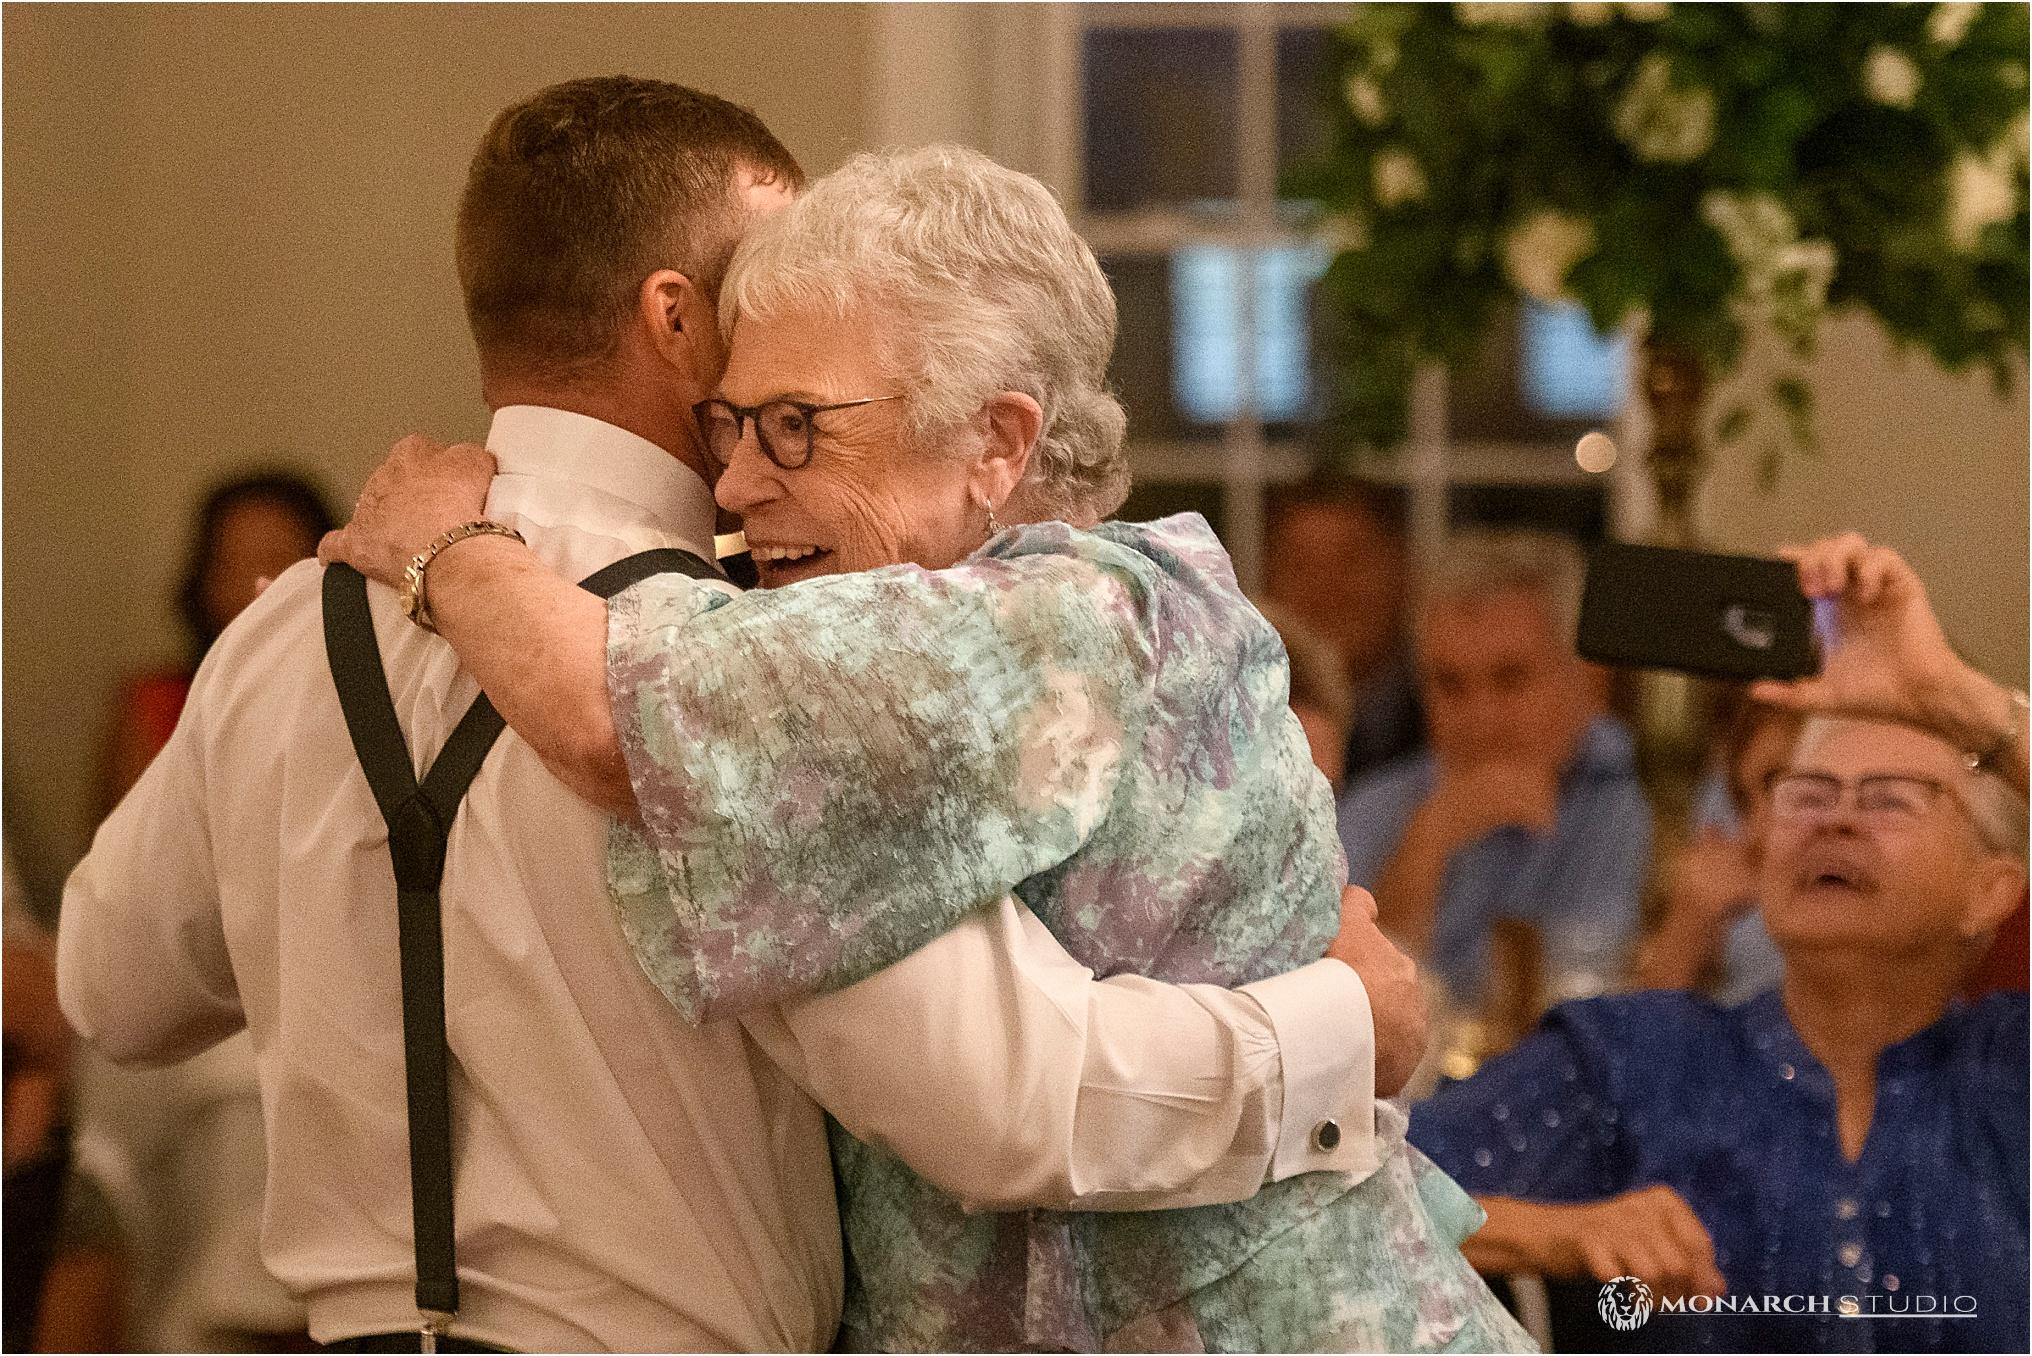 100-whiteroom-wedding-photographer-2019-05-22_0082.jpg